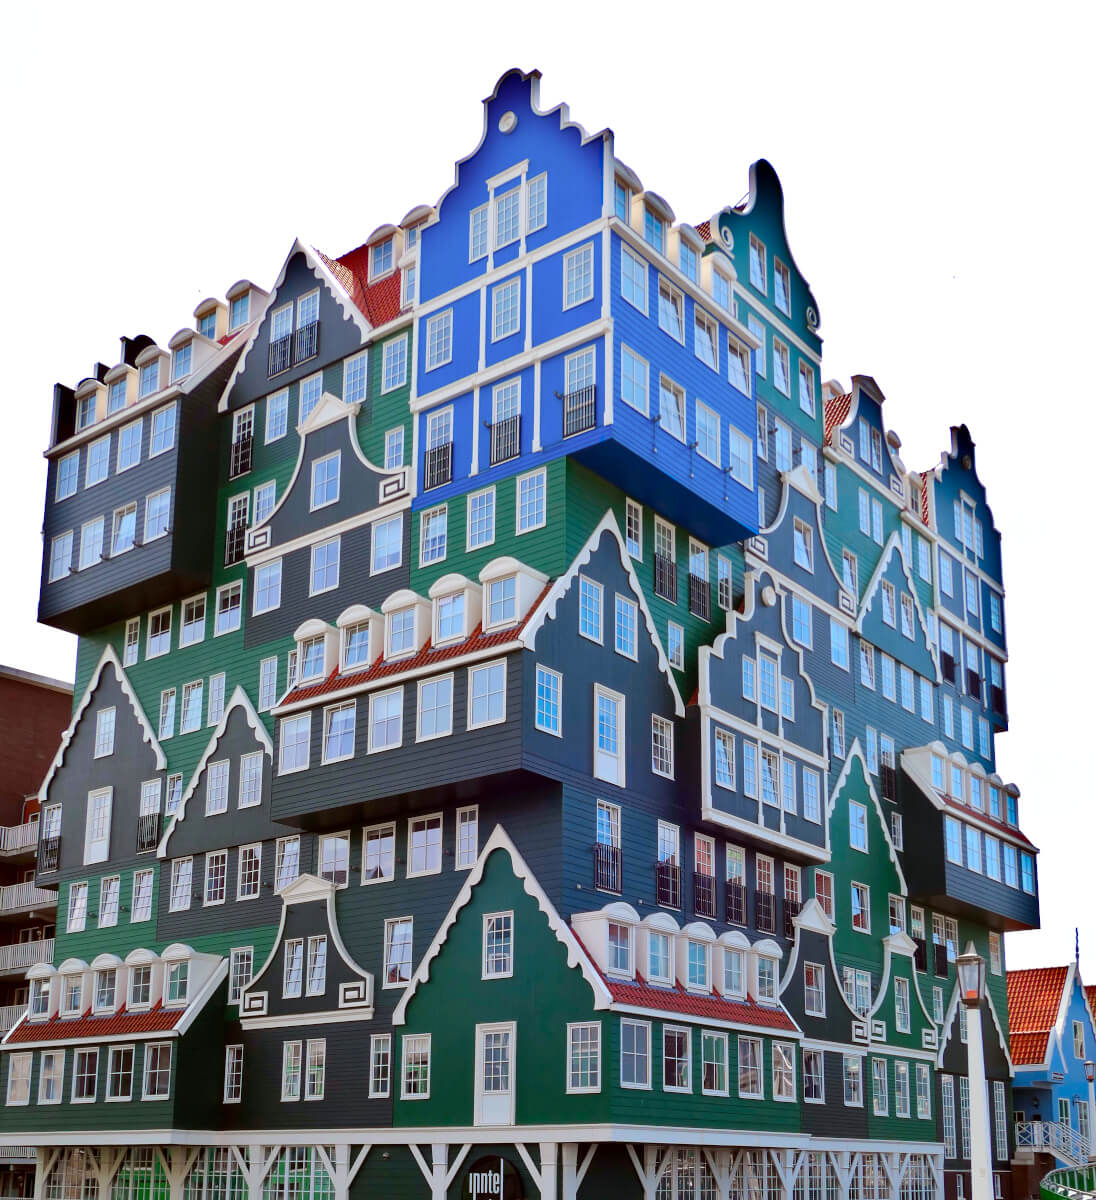 Inntel Hotel, Zaandam, Netherlands